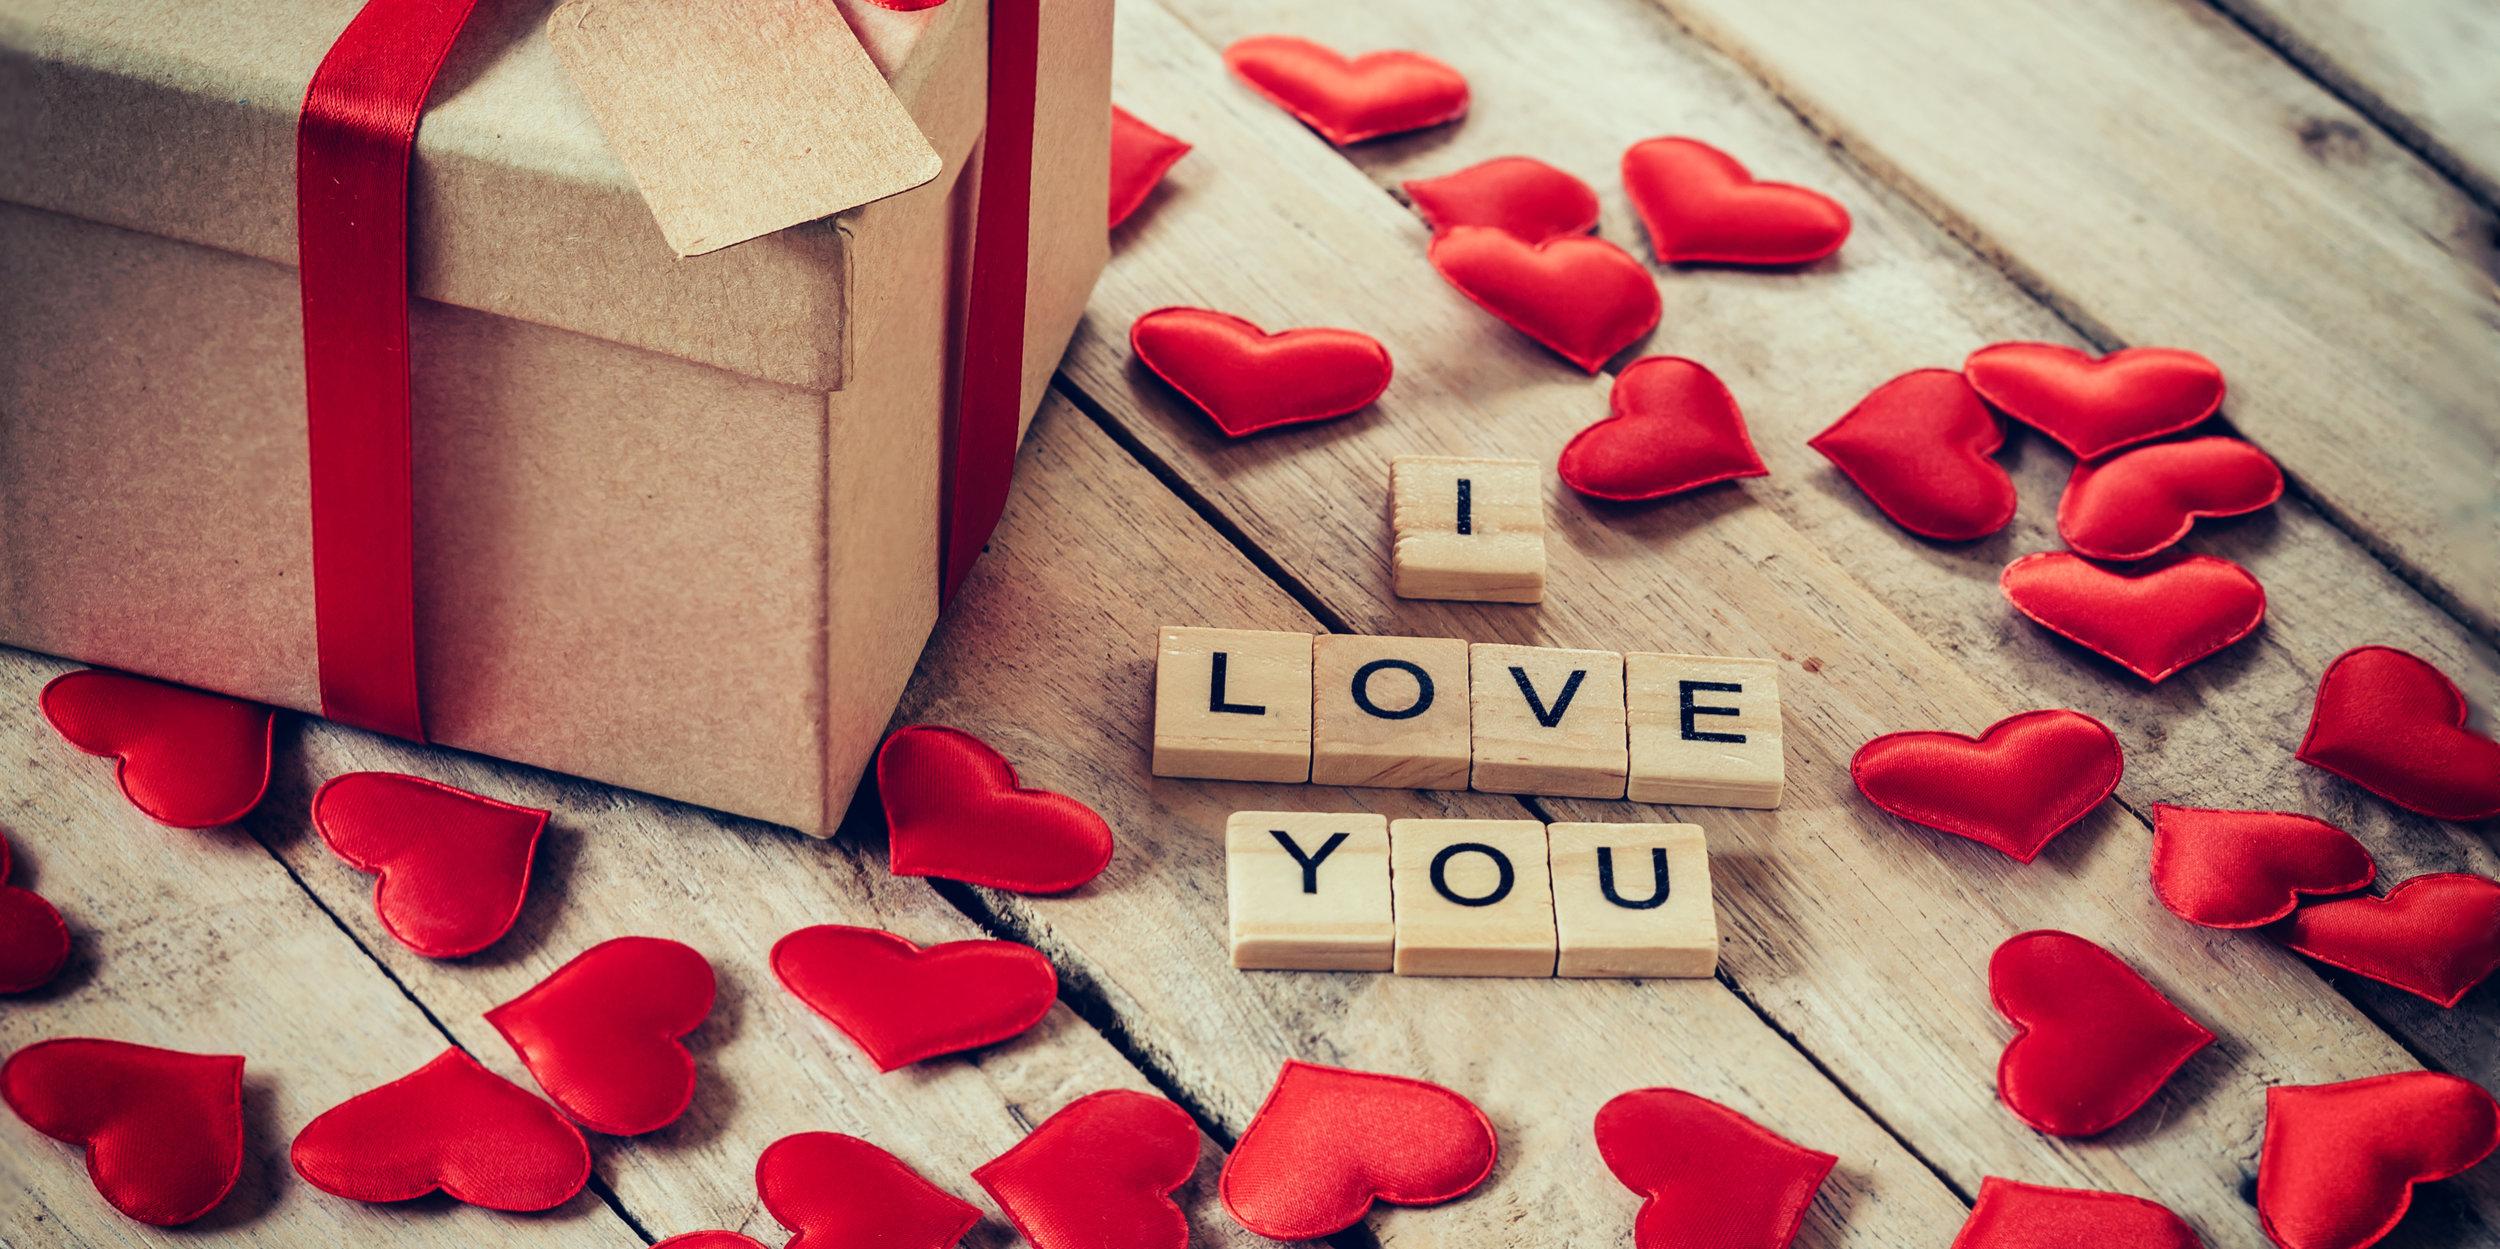 DIY This Valentine's Day! -